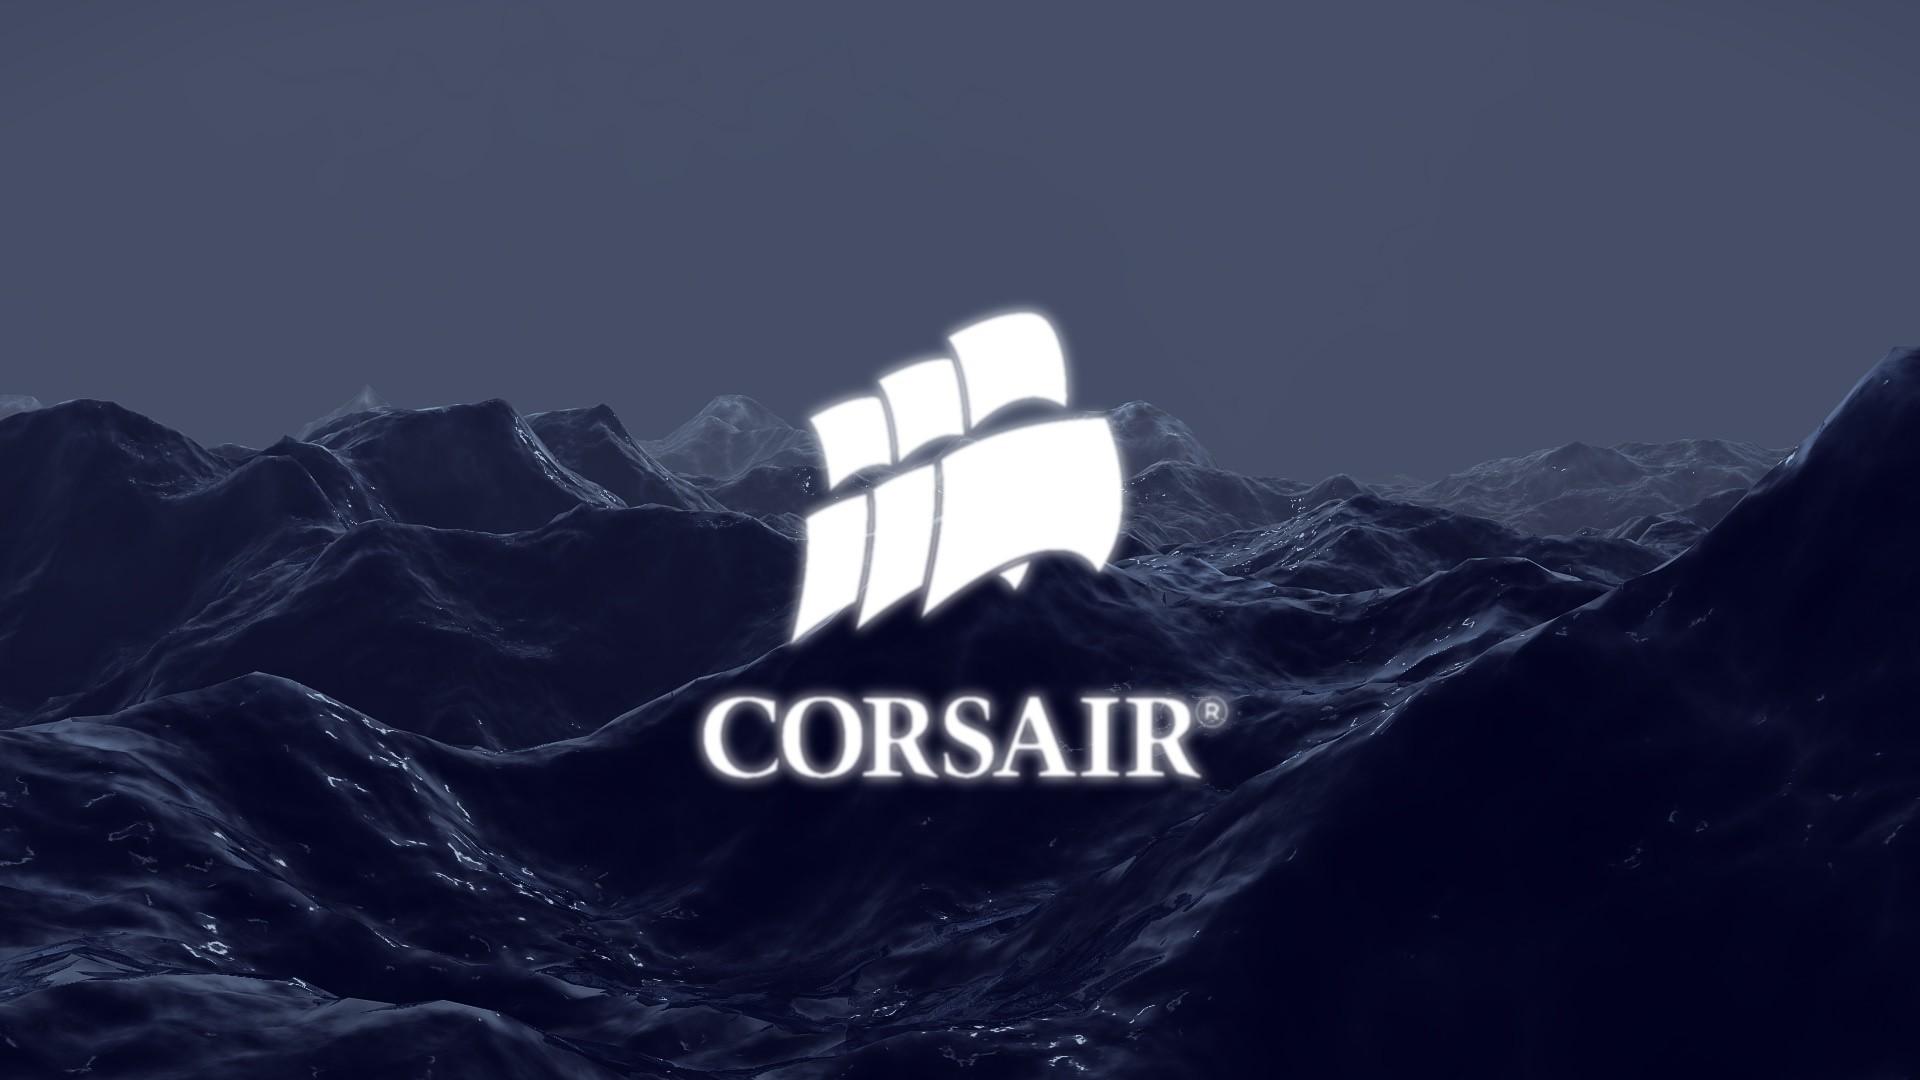 Corsair, Corsair Sea, Corsair Logo